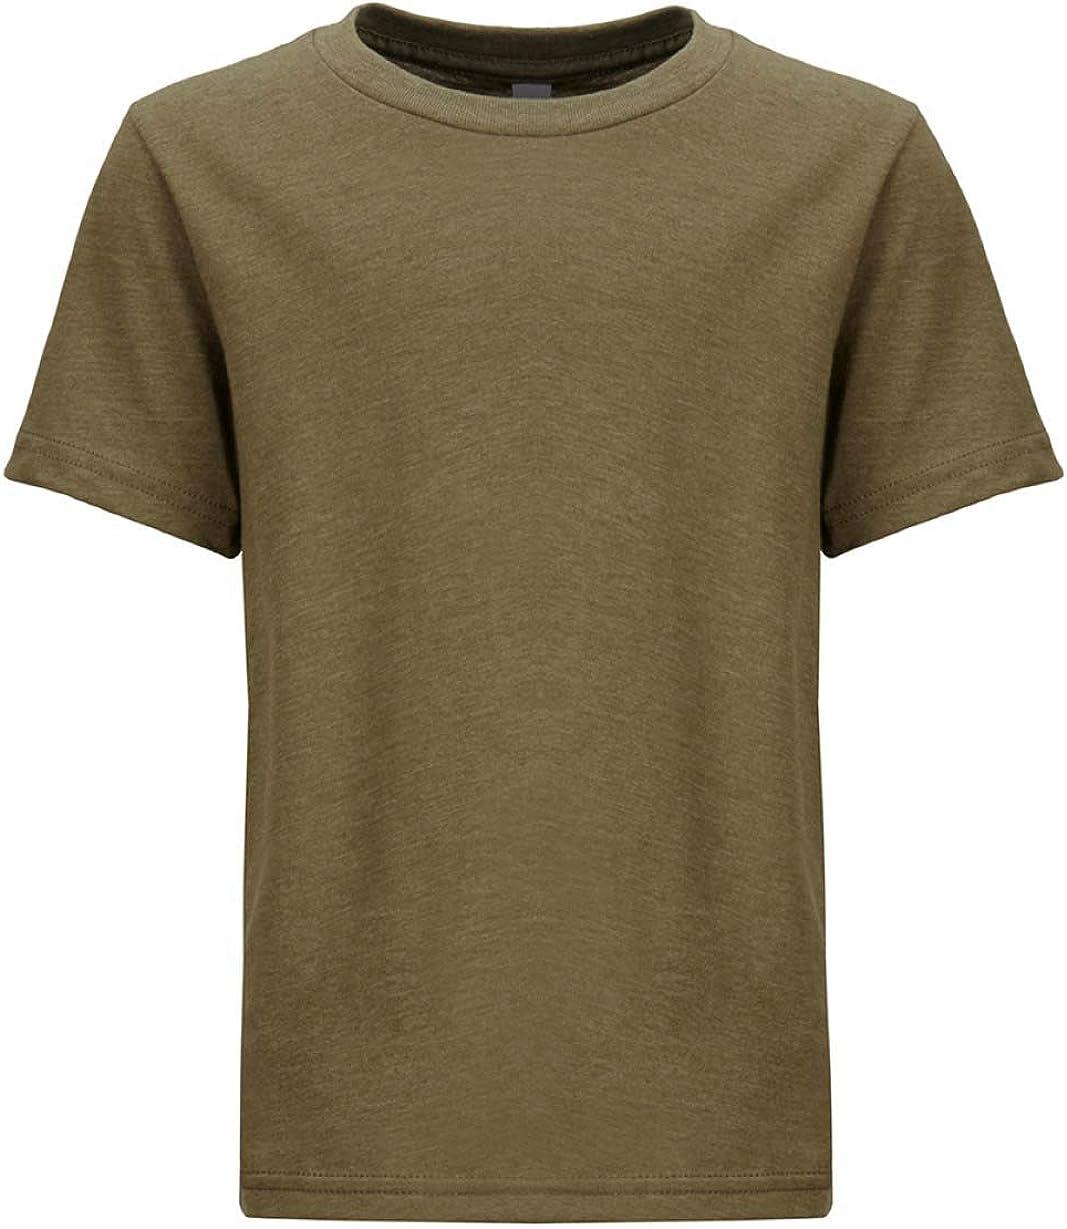 Next Level Kids CVC Crew Neck T-Shirt Military Green S